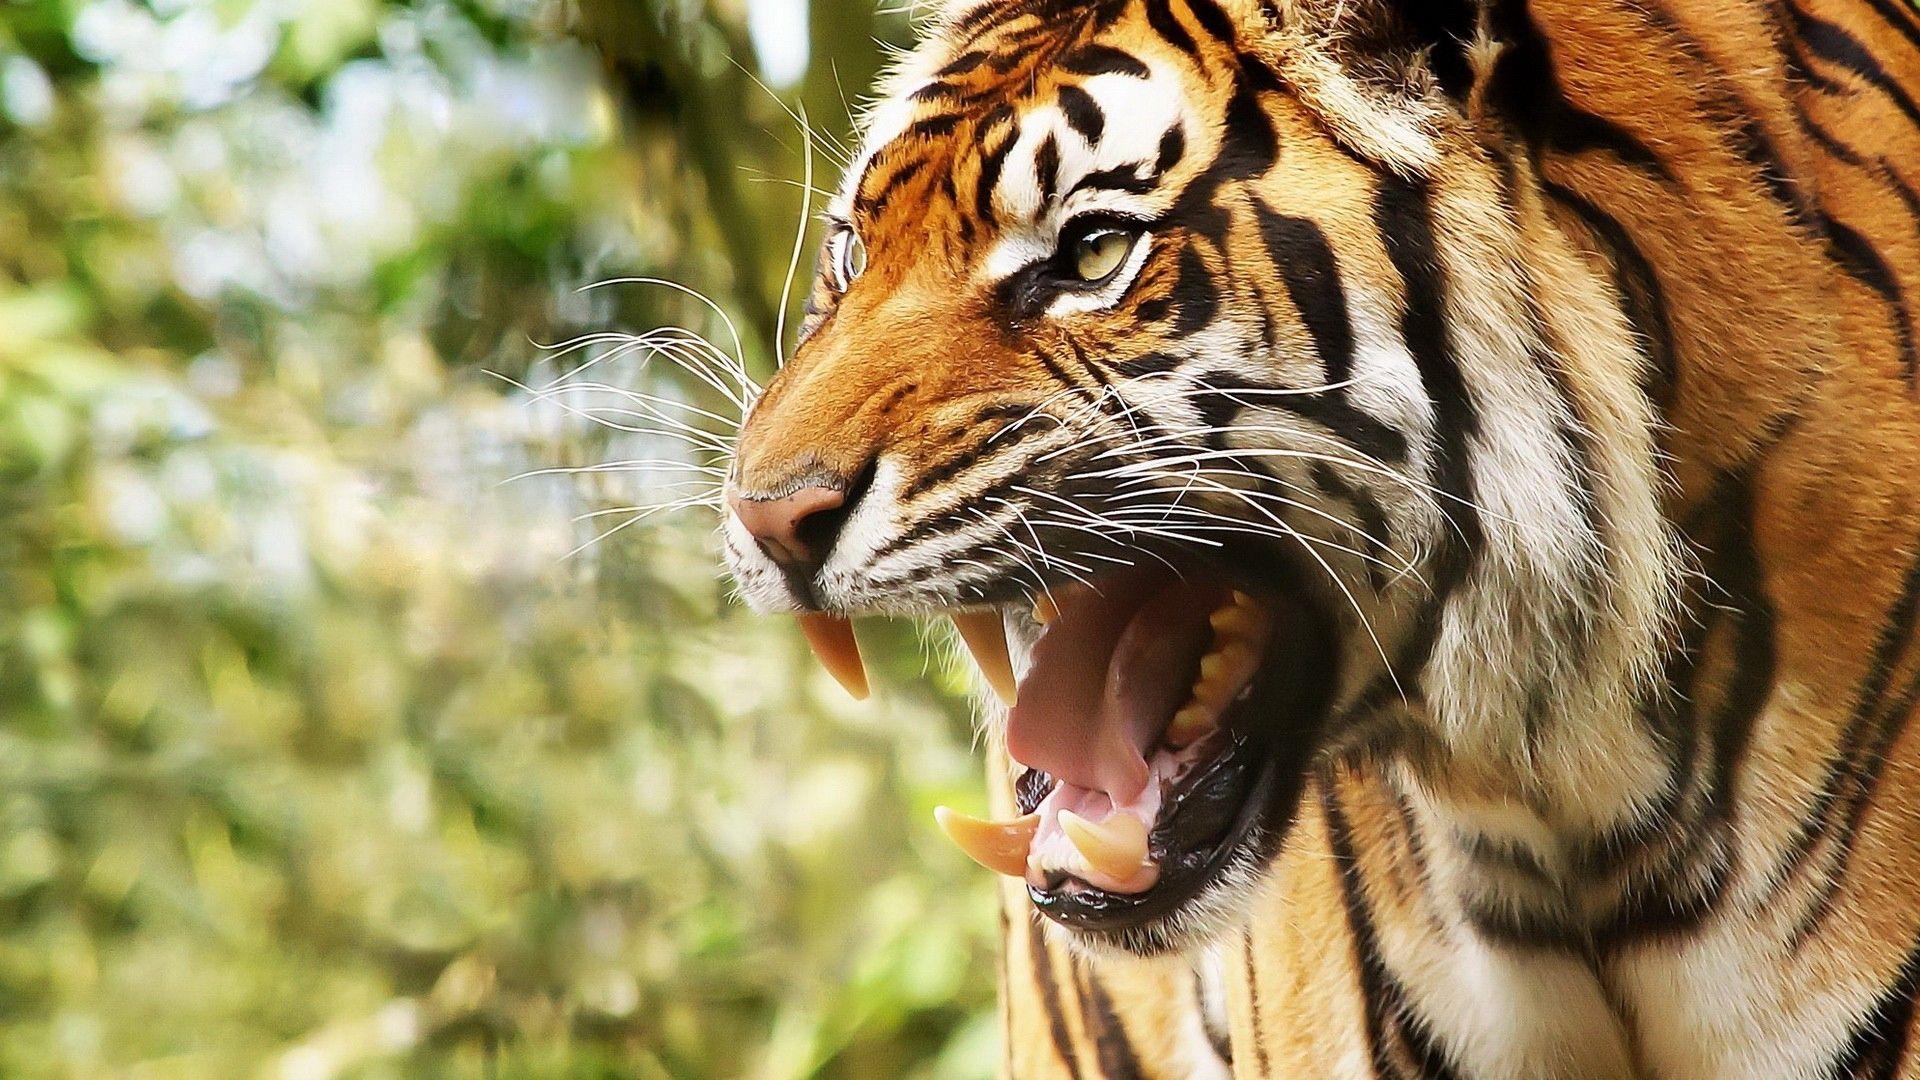 wild tiger hd wallpapers free download download wallpaper | hd